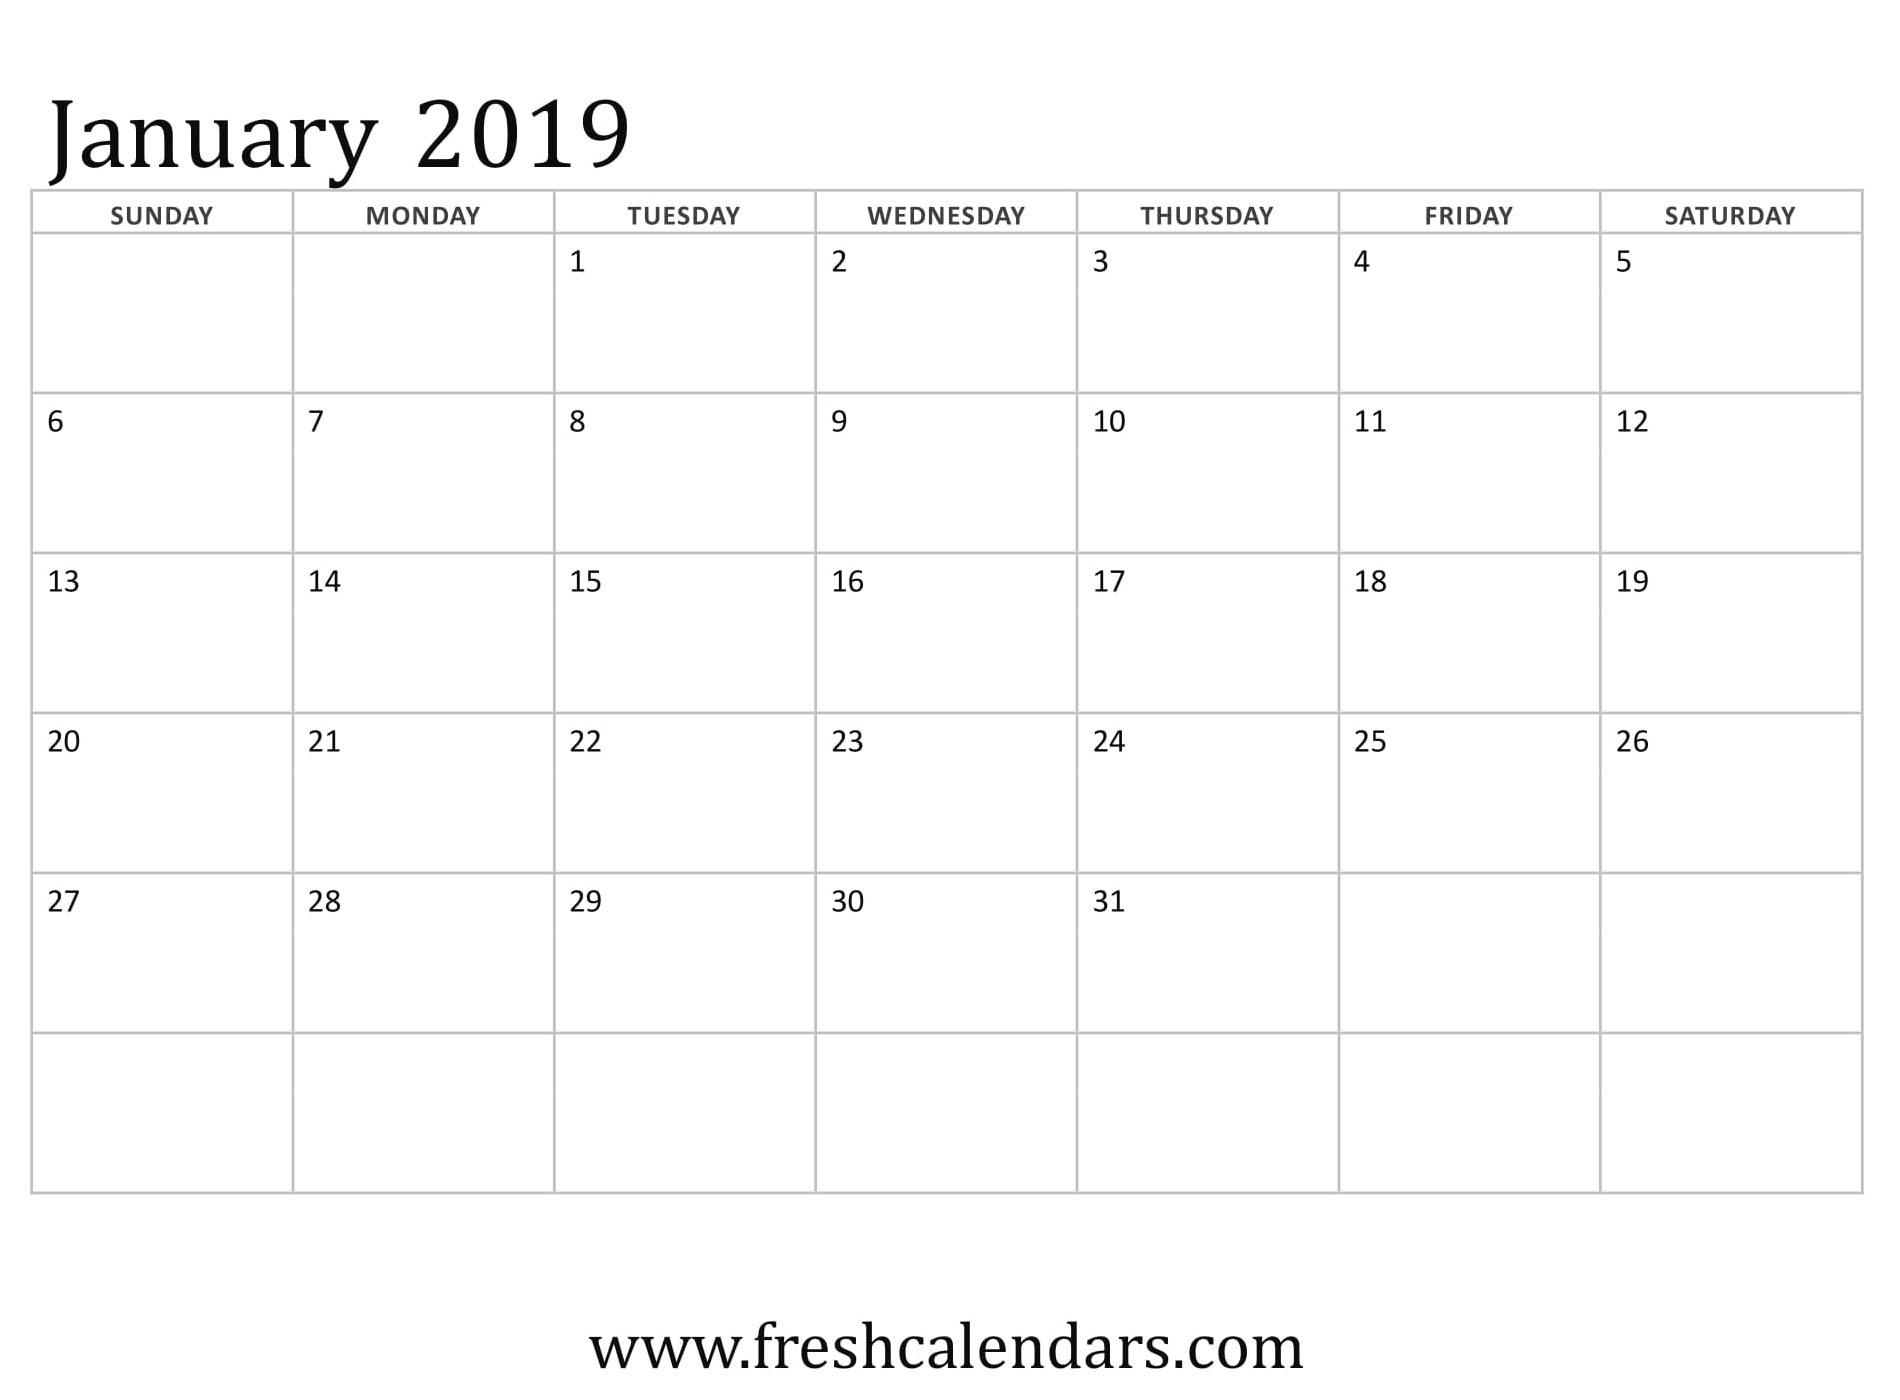 January 2019 Calendar Printable - Fresh Calendars in Monday Through Friday Calendar Template January Printable